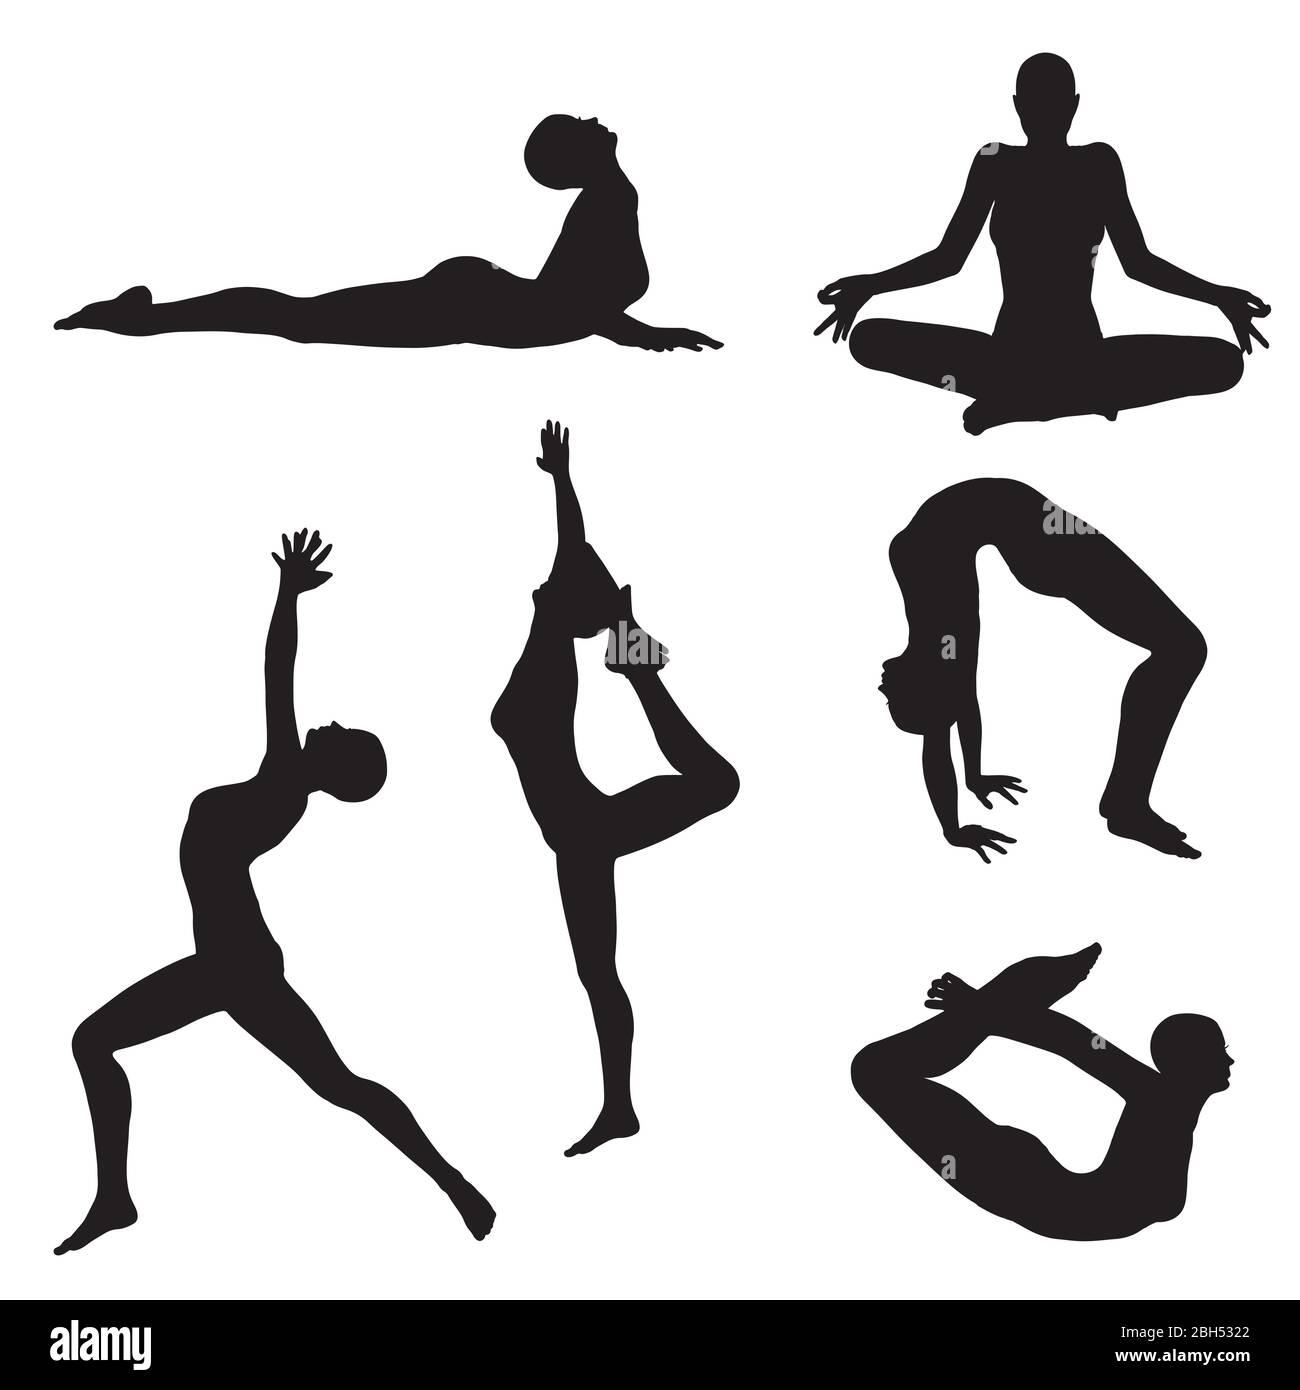 Yoga Poses Black and White Stock Photos & Images - Alamy